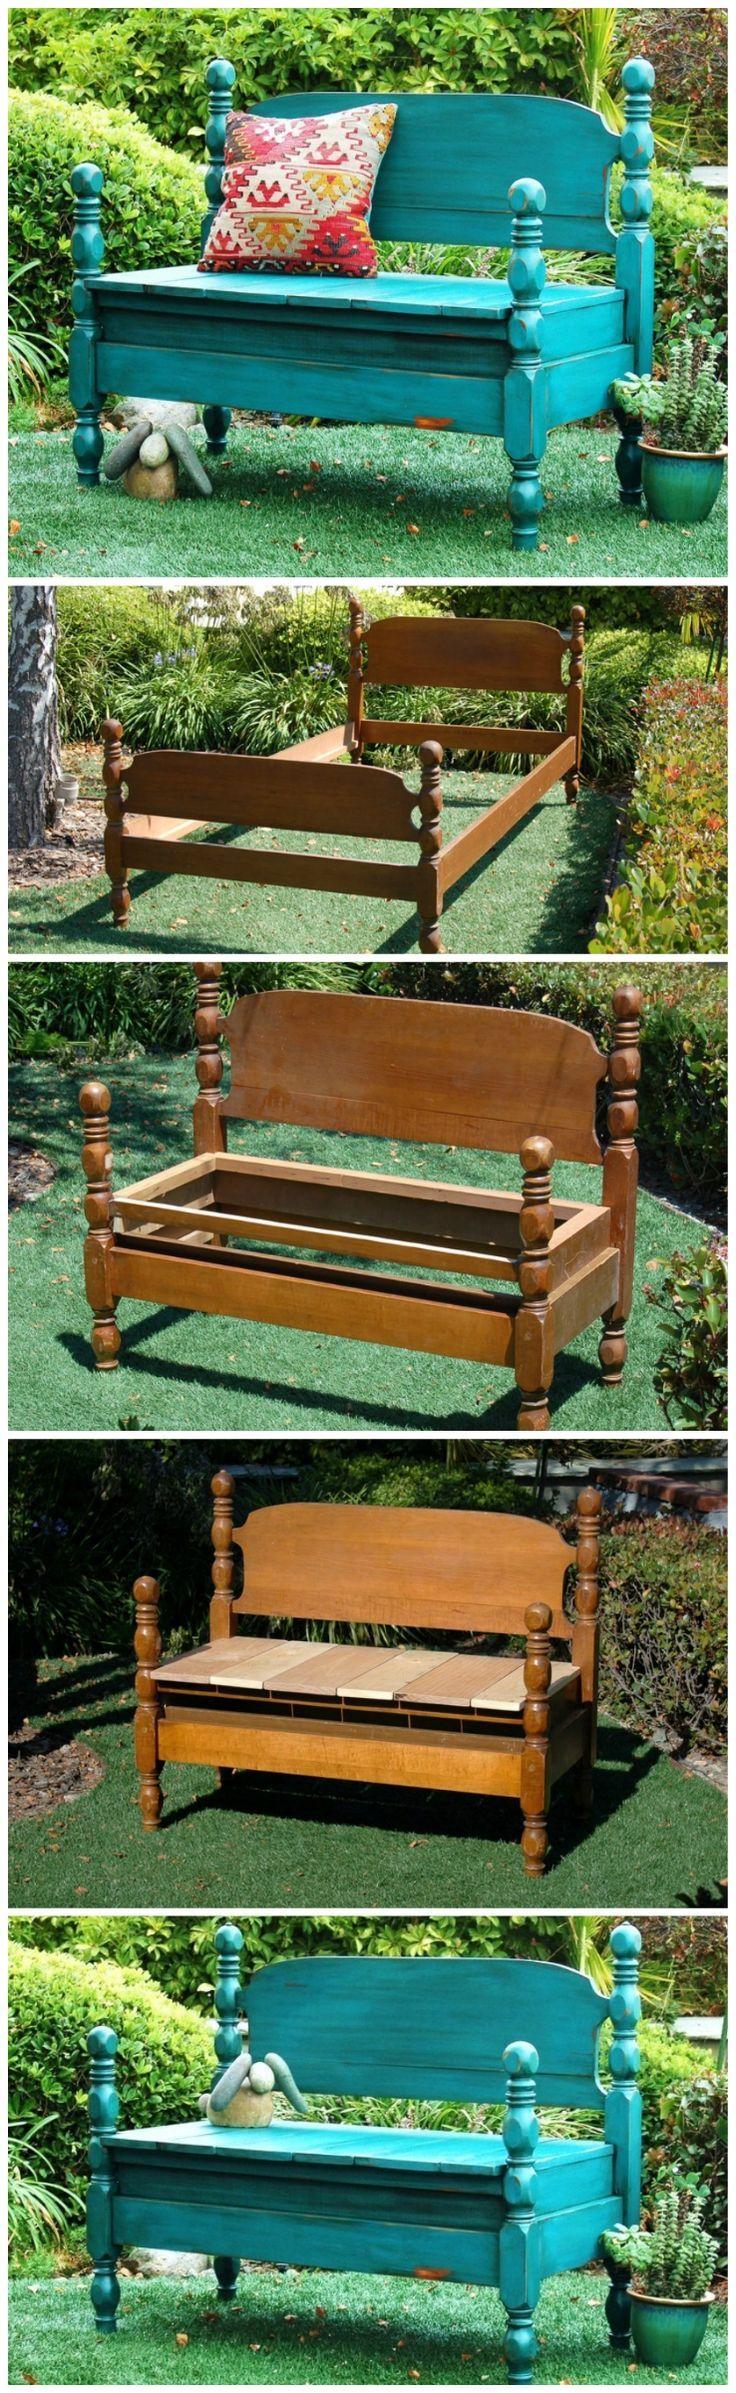 Diy bed turned into bench diy stuff pinterest diy furniture